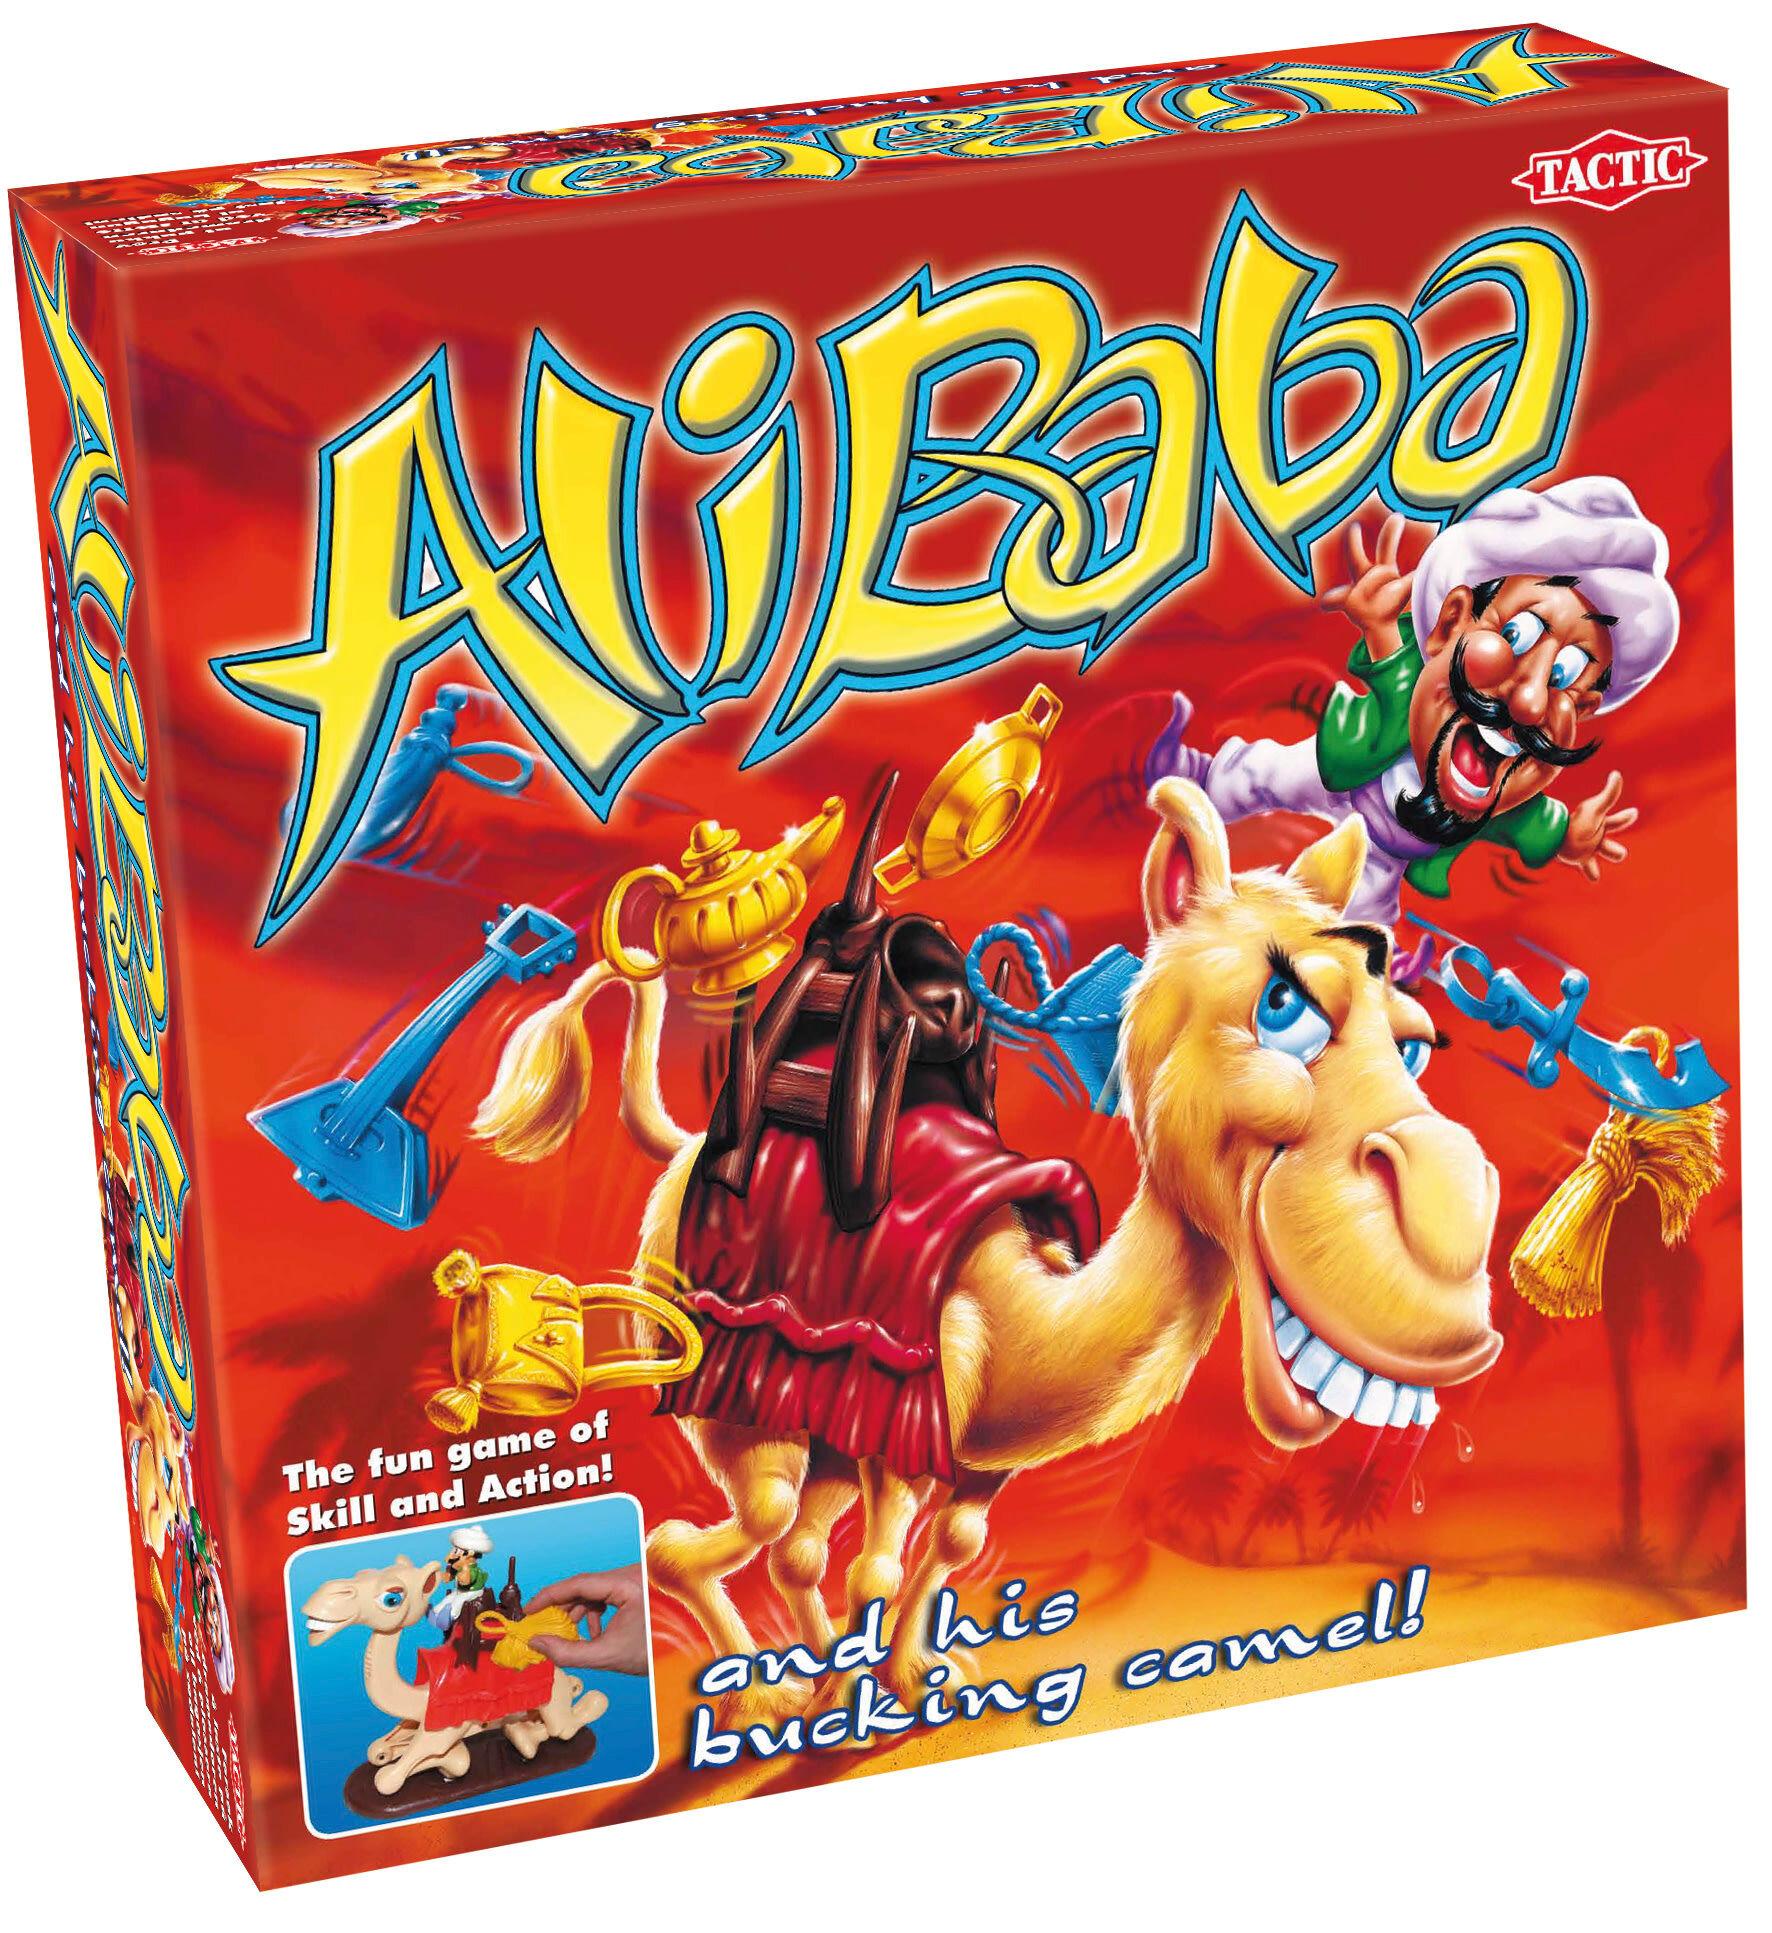 Tactic Alibaba peli